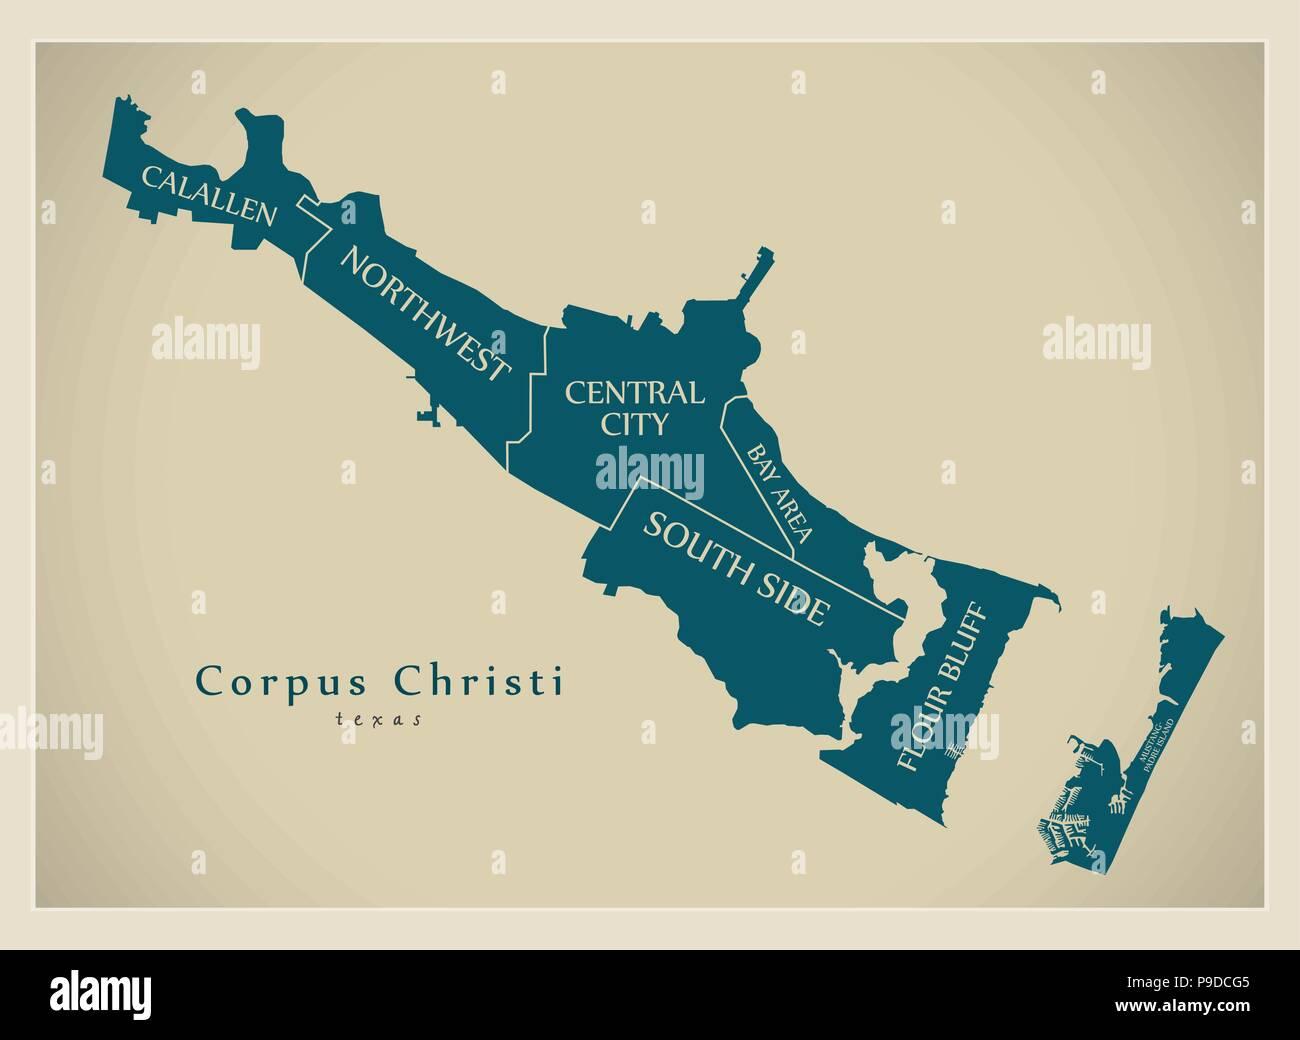 Modern City Map - Corpus Christi Texas city of the USA with neighborhoods and titles - Stock Vector